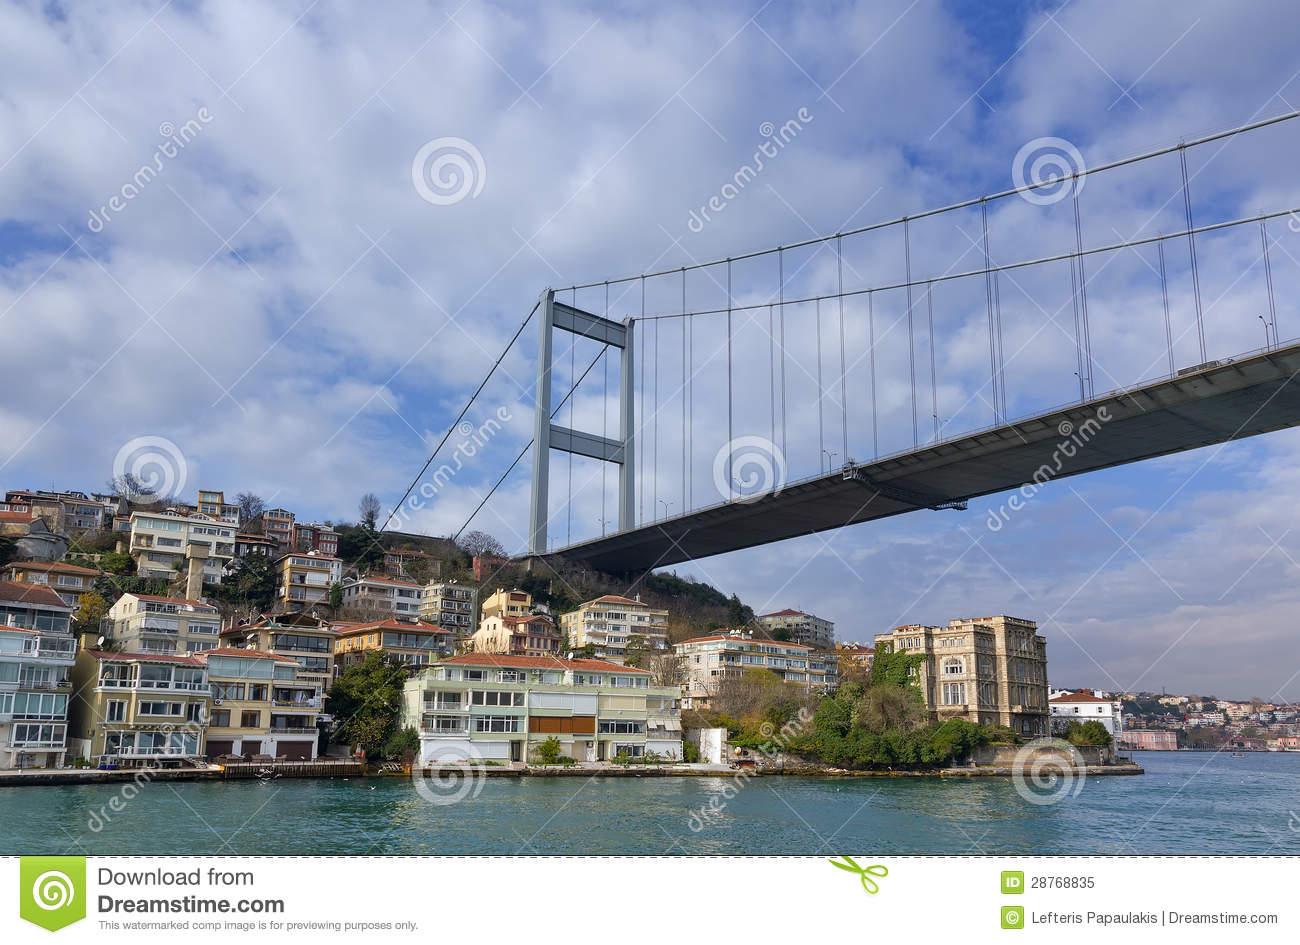 Fatih Sultan Mehmet Bridge Over Hisarustu Neighborhood, Istanbul.